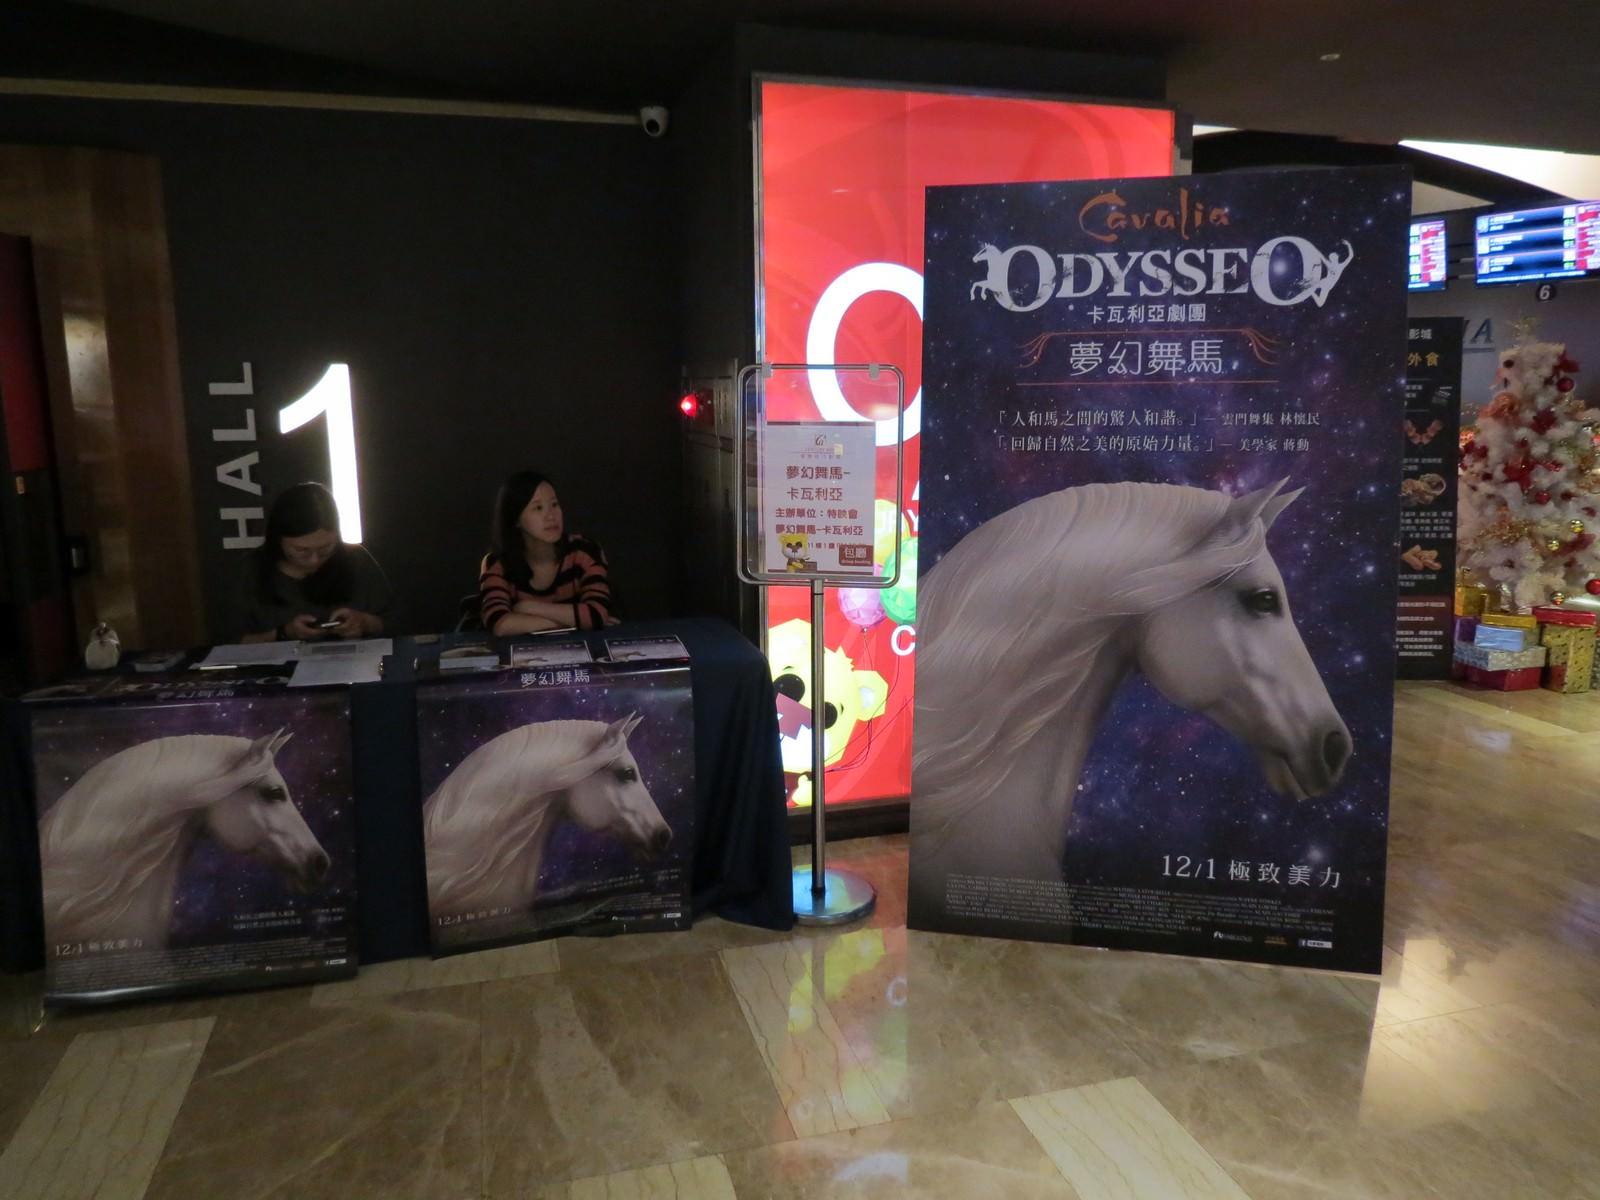 Movie, Odysseo by Cavalia(韓國, 2015年) / 夢幻舞馬-卡瓦利亞(台灣), 特映會場地